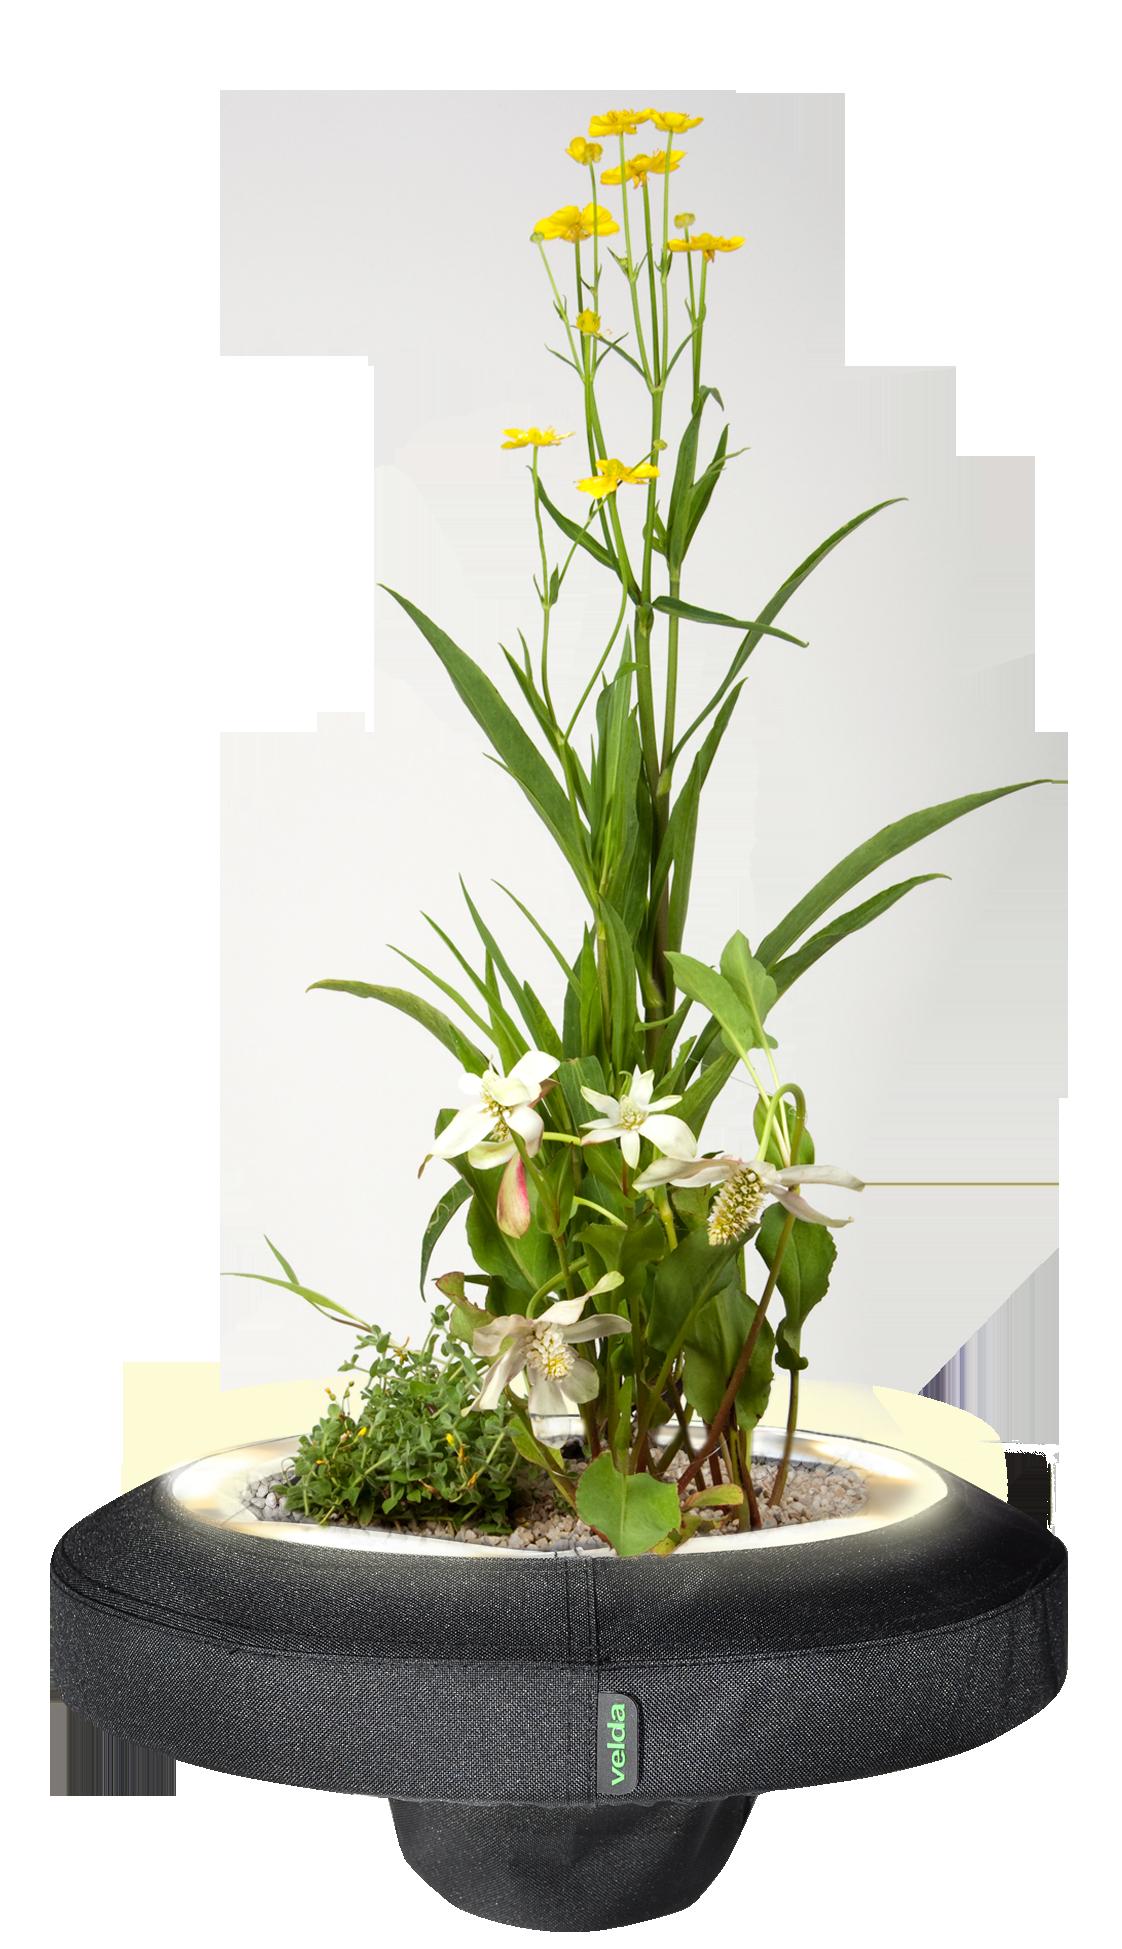 Velda Floating Plant Light